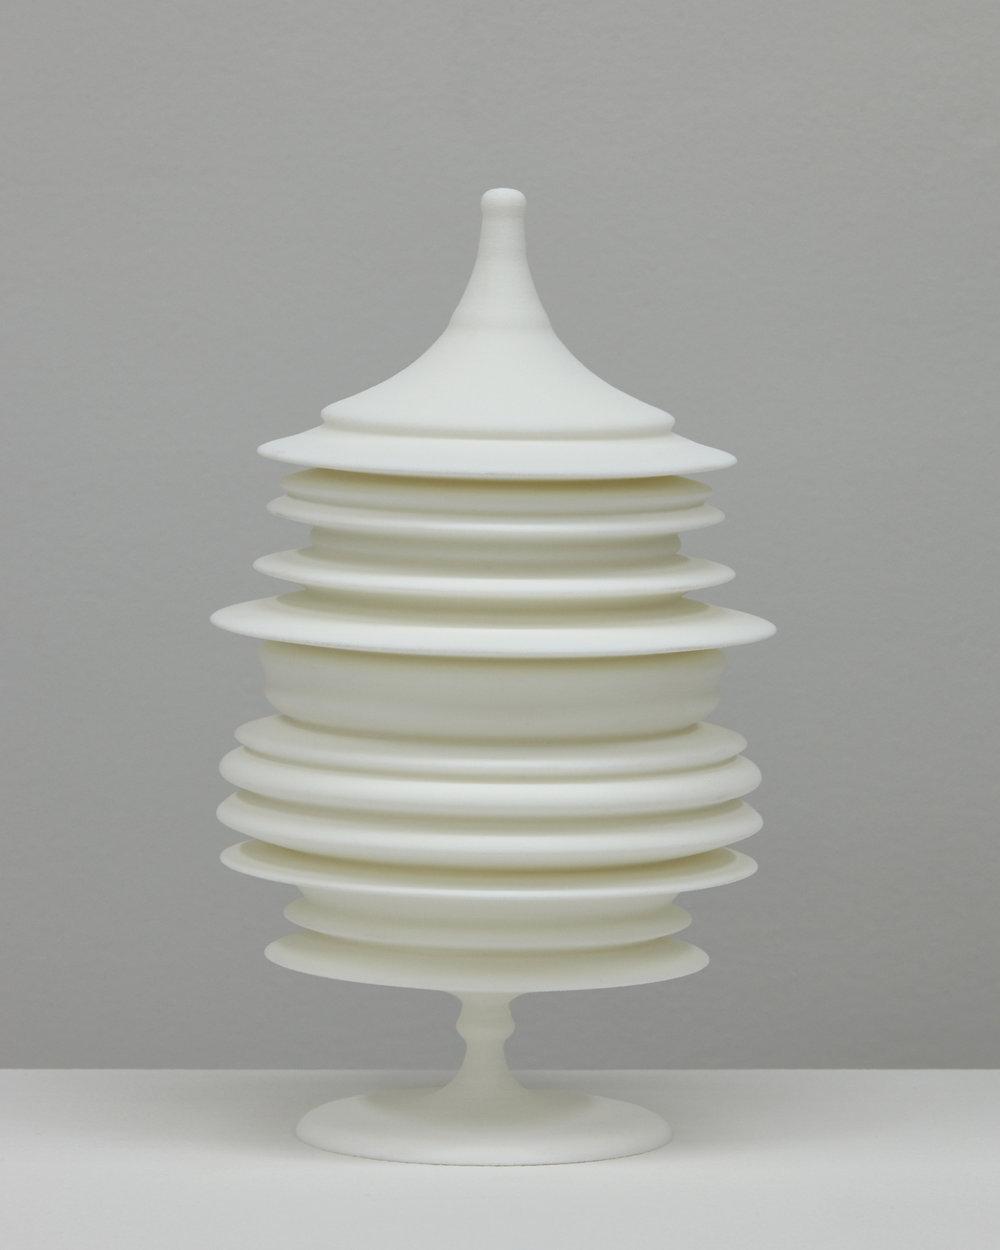 "Laura Splan, ""Manifest (Furrow),"" 2015, Laser sintered polyamide nylon, 8 x 4.75 x 4.75 inches, edition of 5 plus one artist proof"